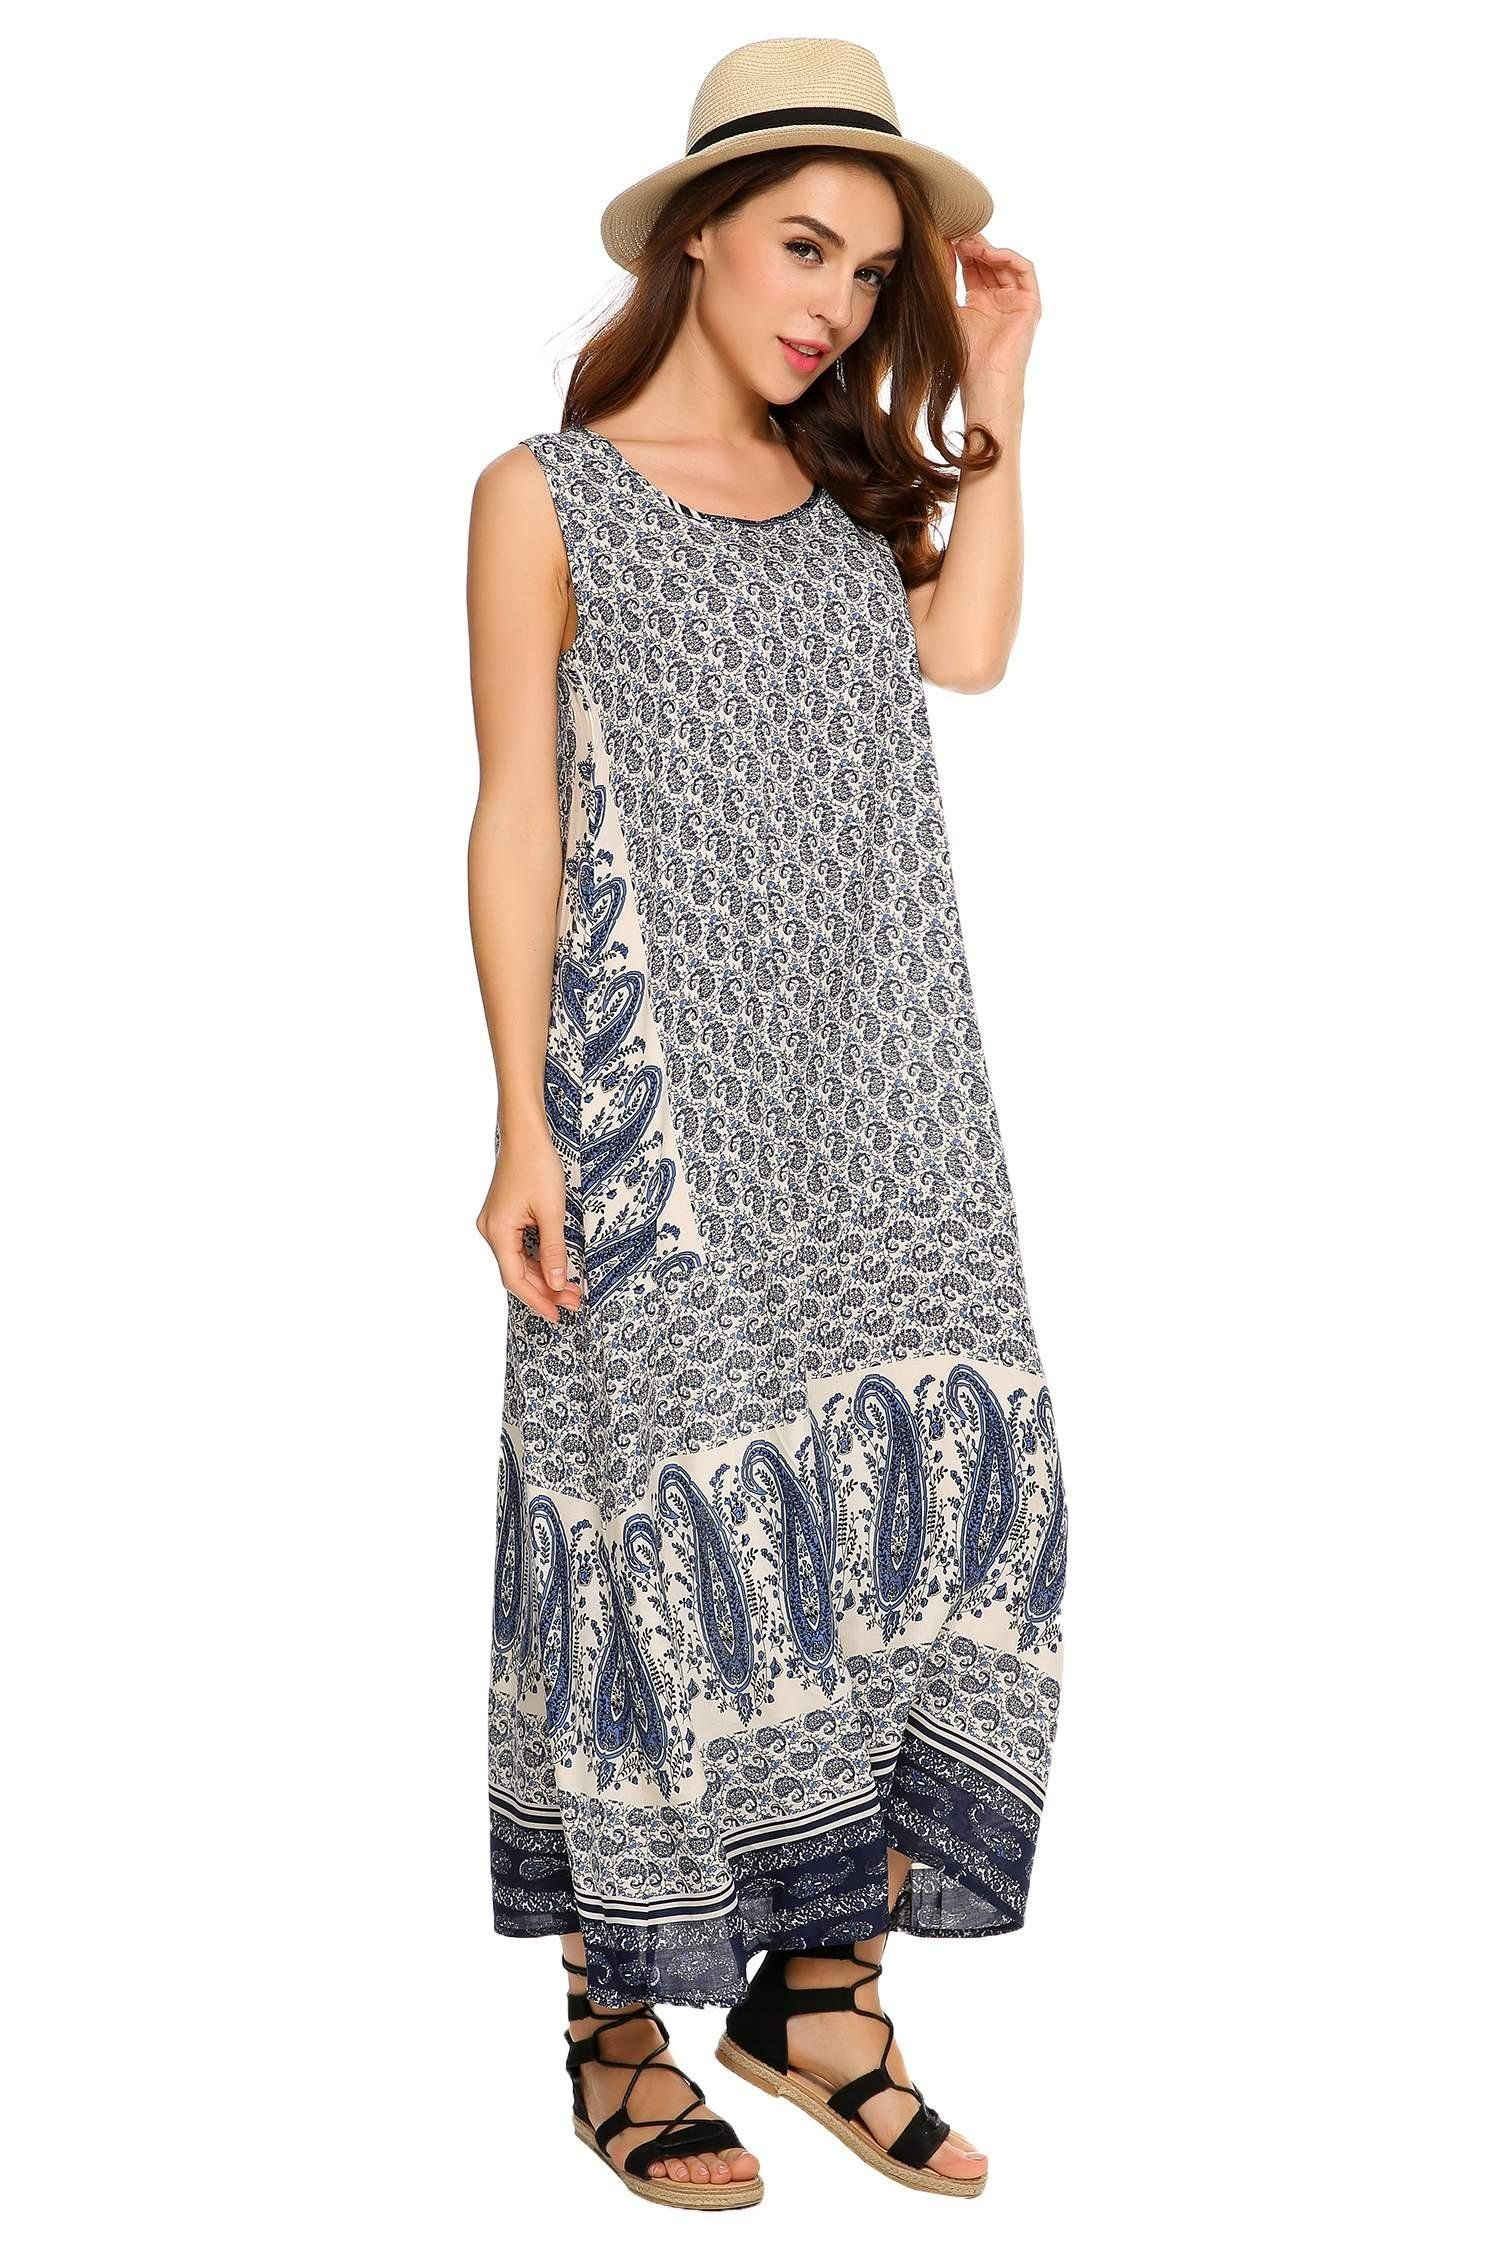 b4e8999a65fe7 Zeela Womens Floral Sleeveless Loose Casual Long Maxi Tank Beach DressBlueL      Click on